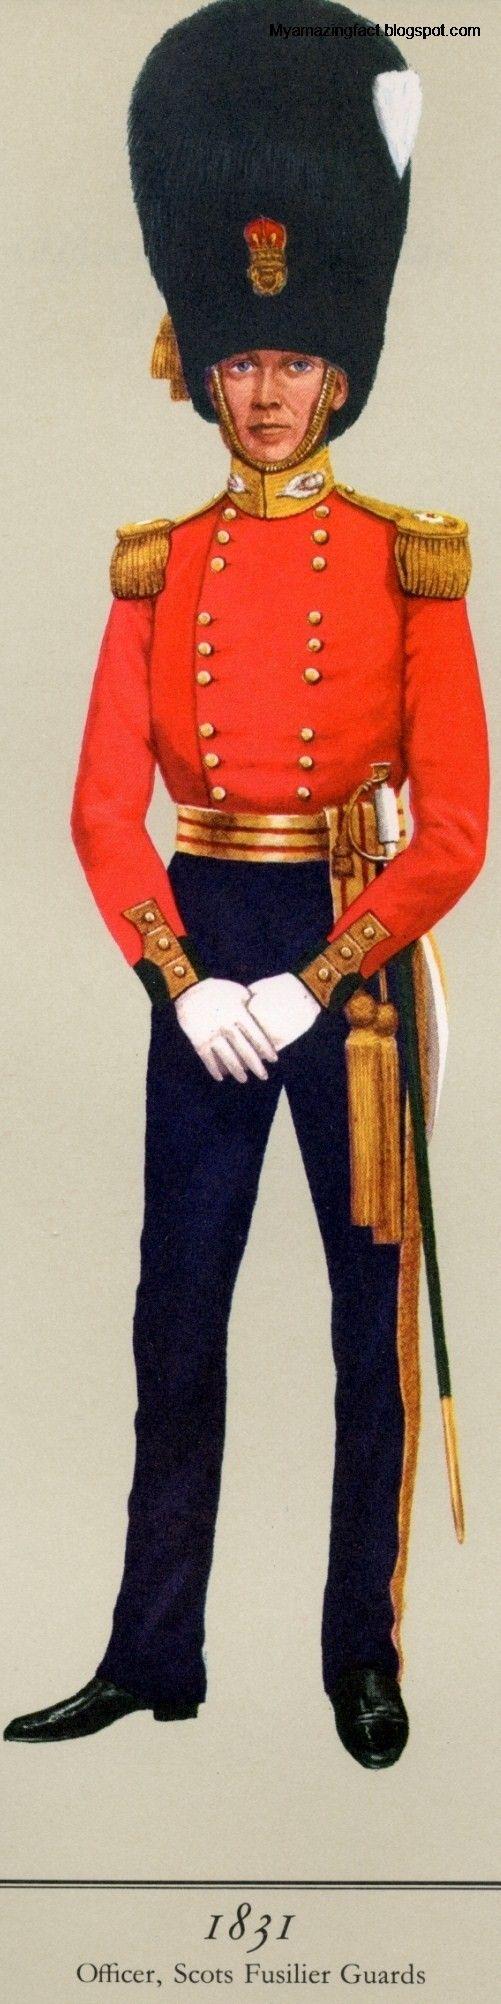 158 best Uniformes Militares images on Pinterest | Military ...